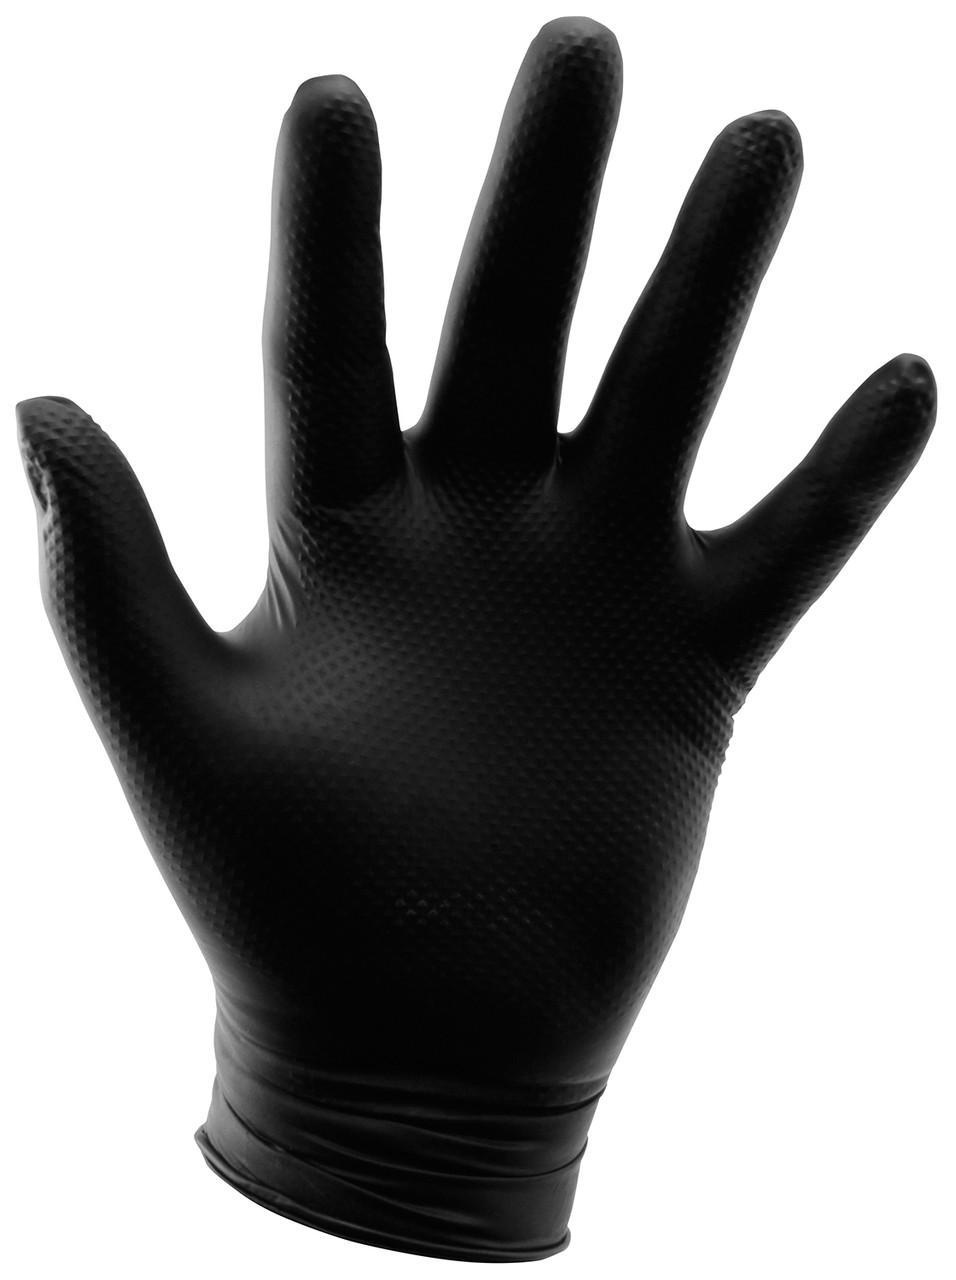 Grower's Edge Black Powder Free Diamond Textured Nitrile Gloves 6 mil 100ct